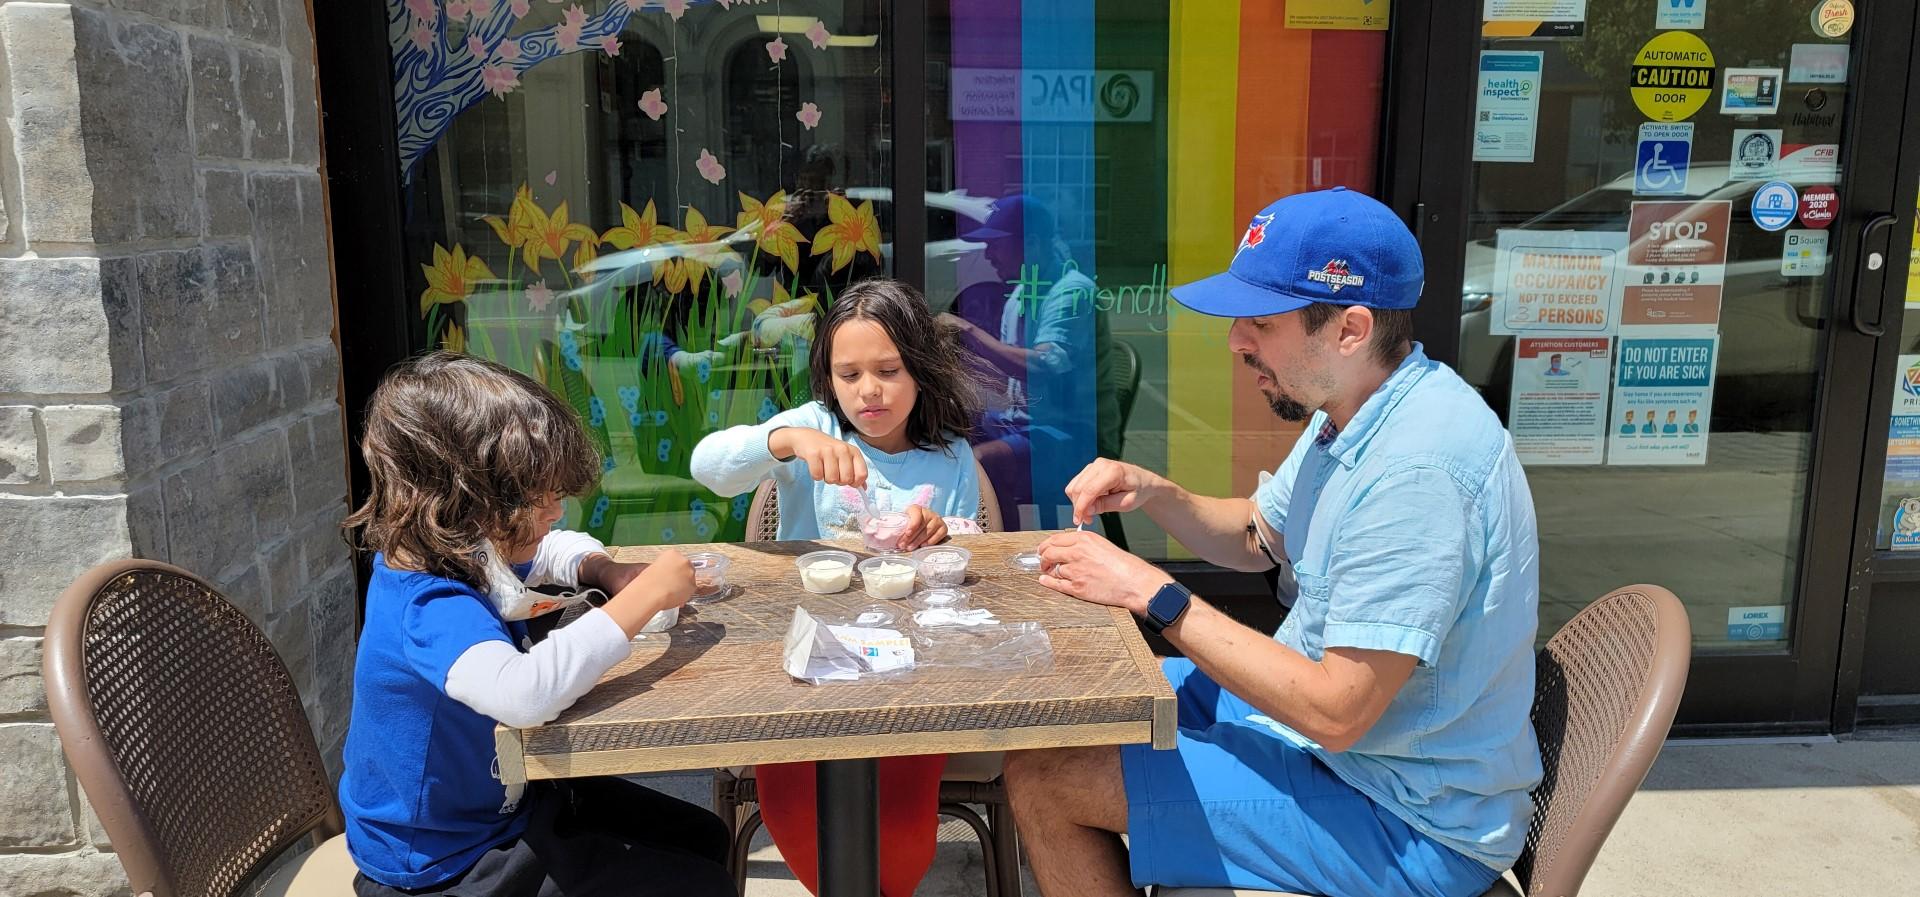 kids and dad enjoying ice cream